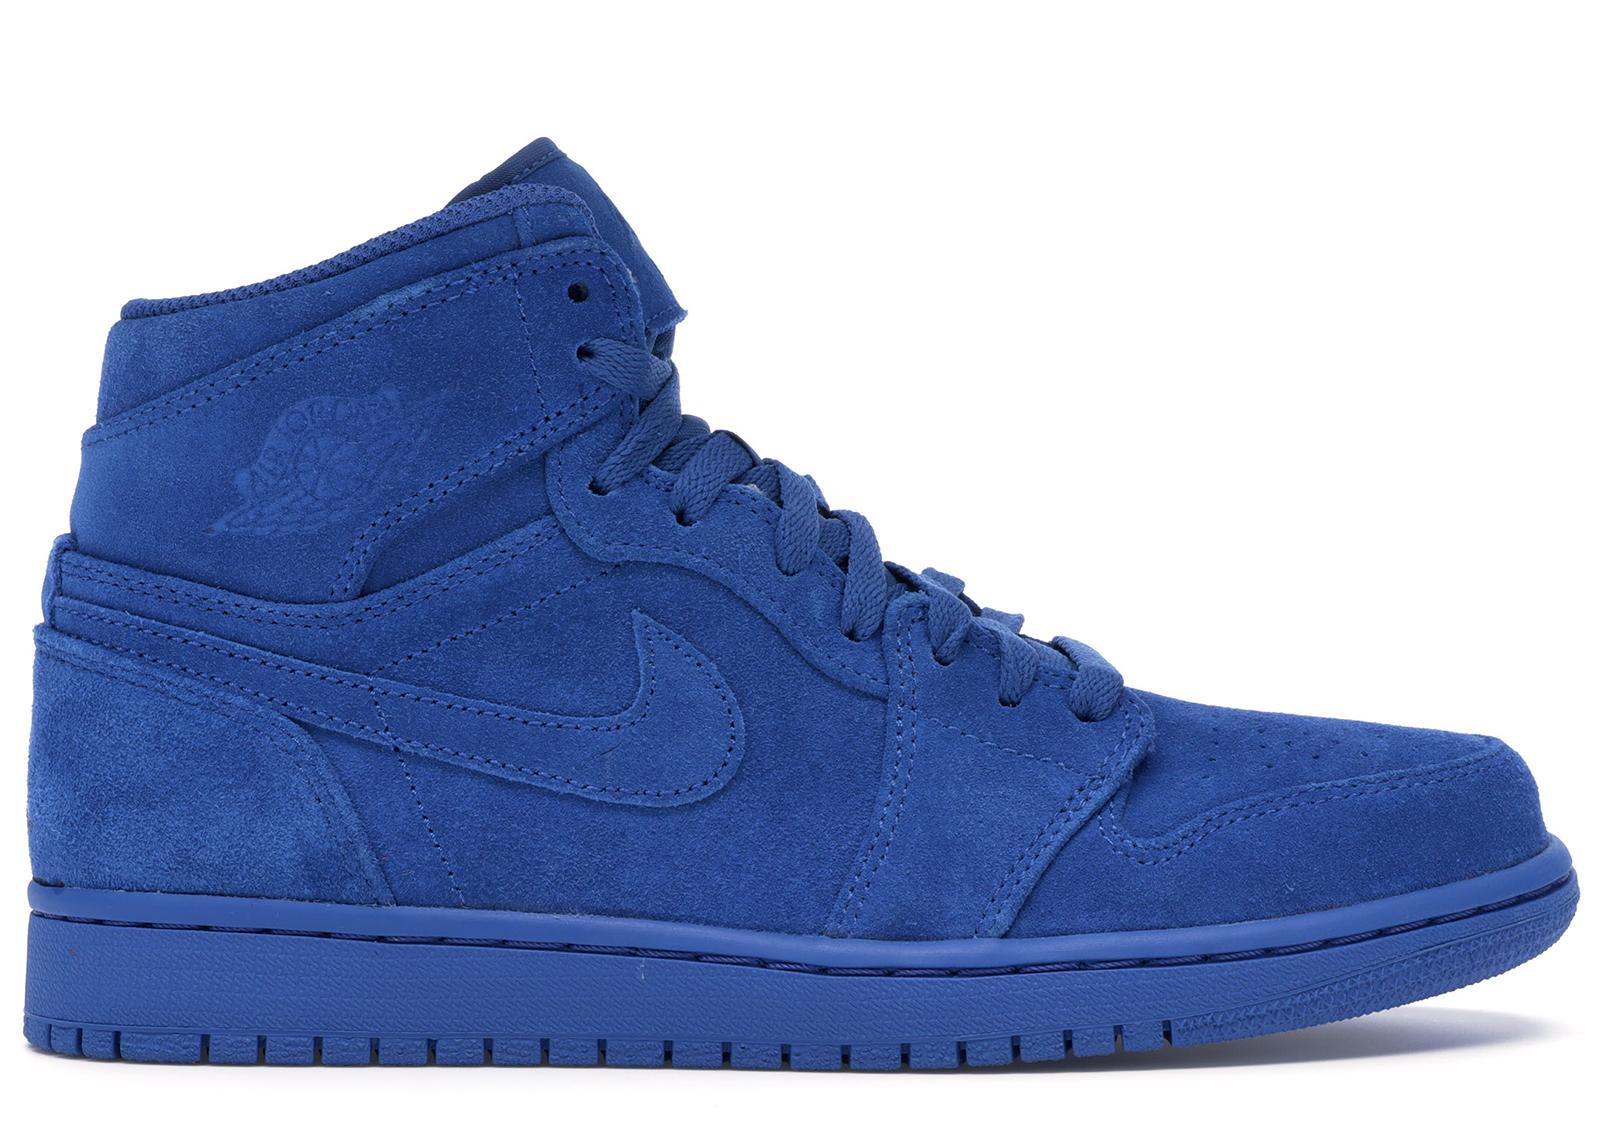 all blue jordan ones